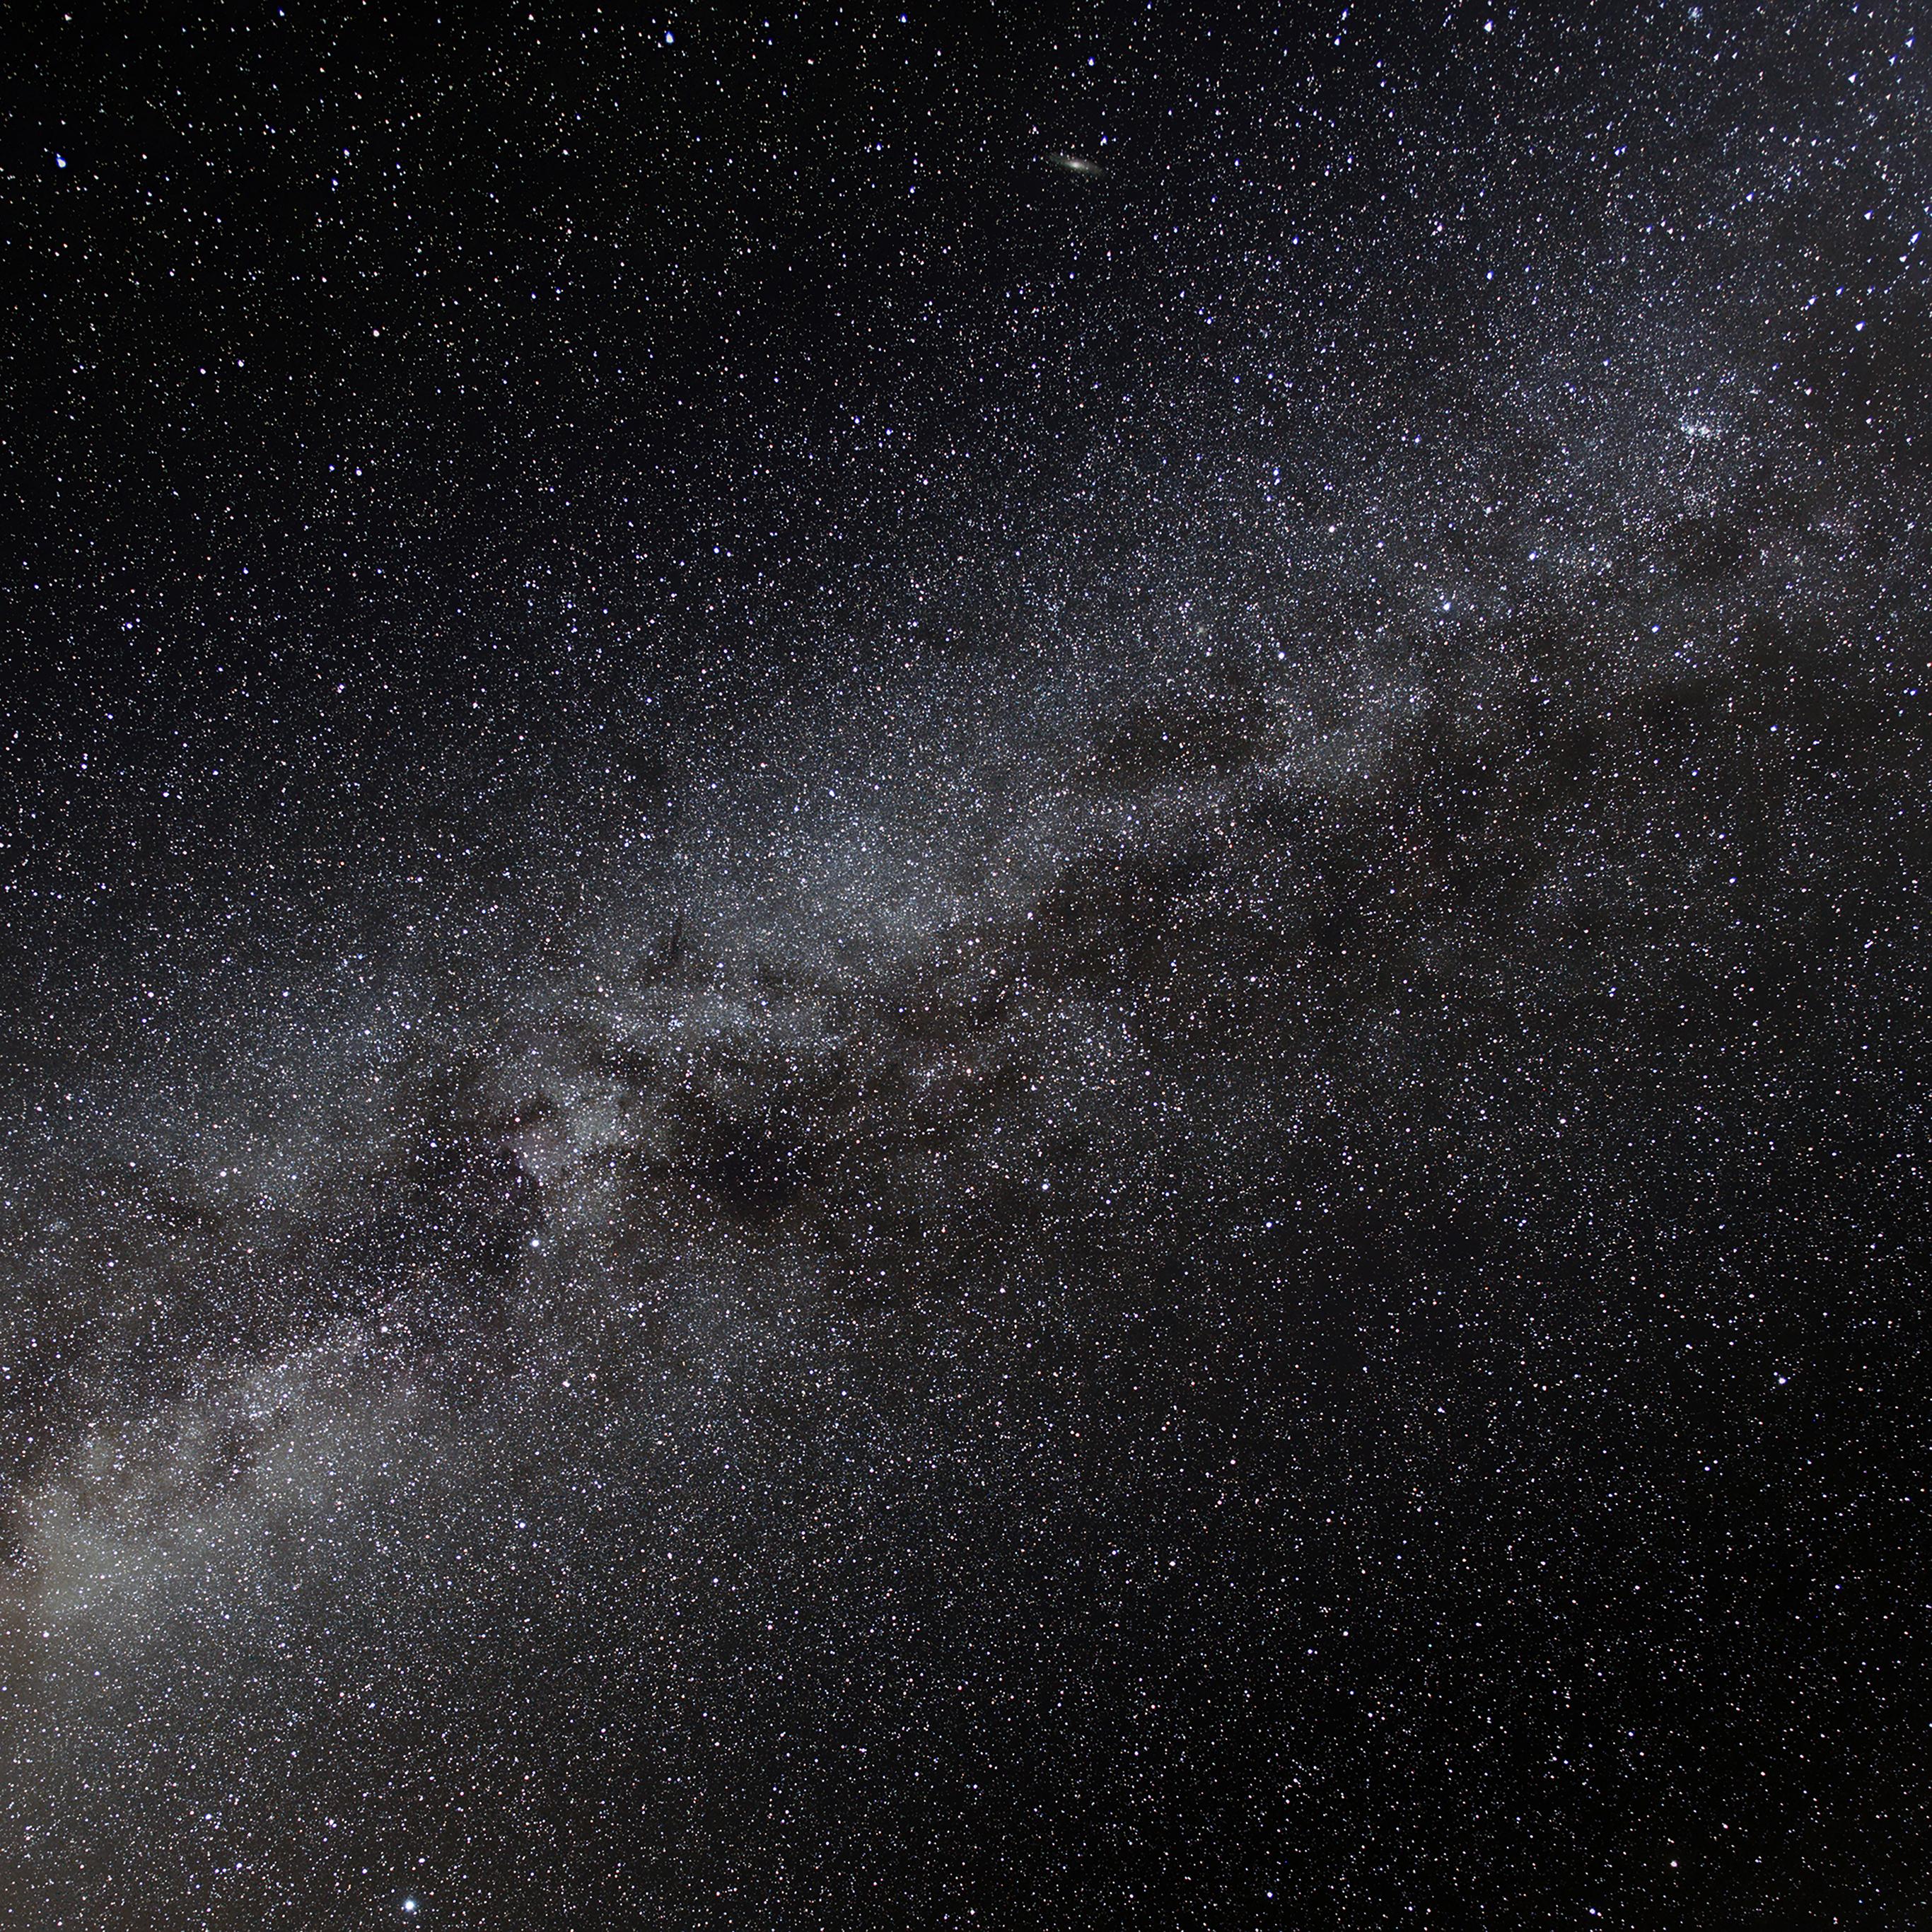 Md62 Star Space Galaxy Wallpaper